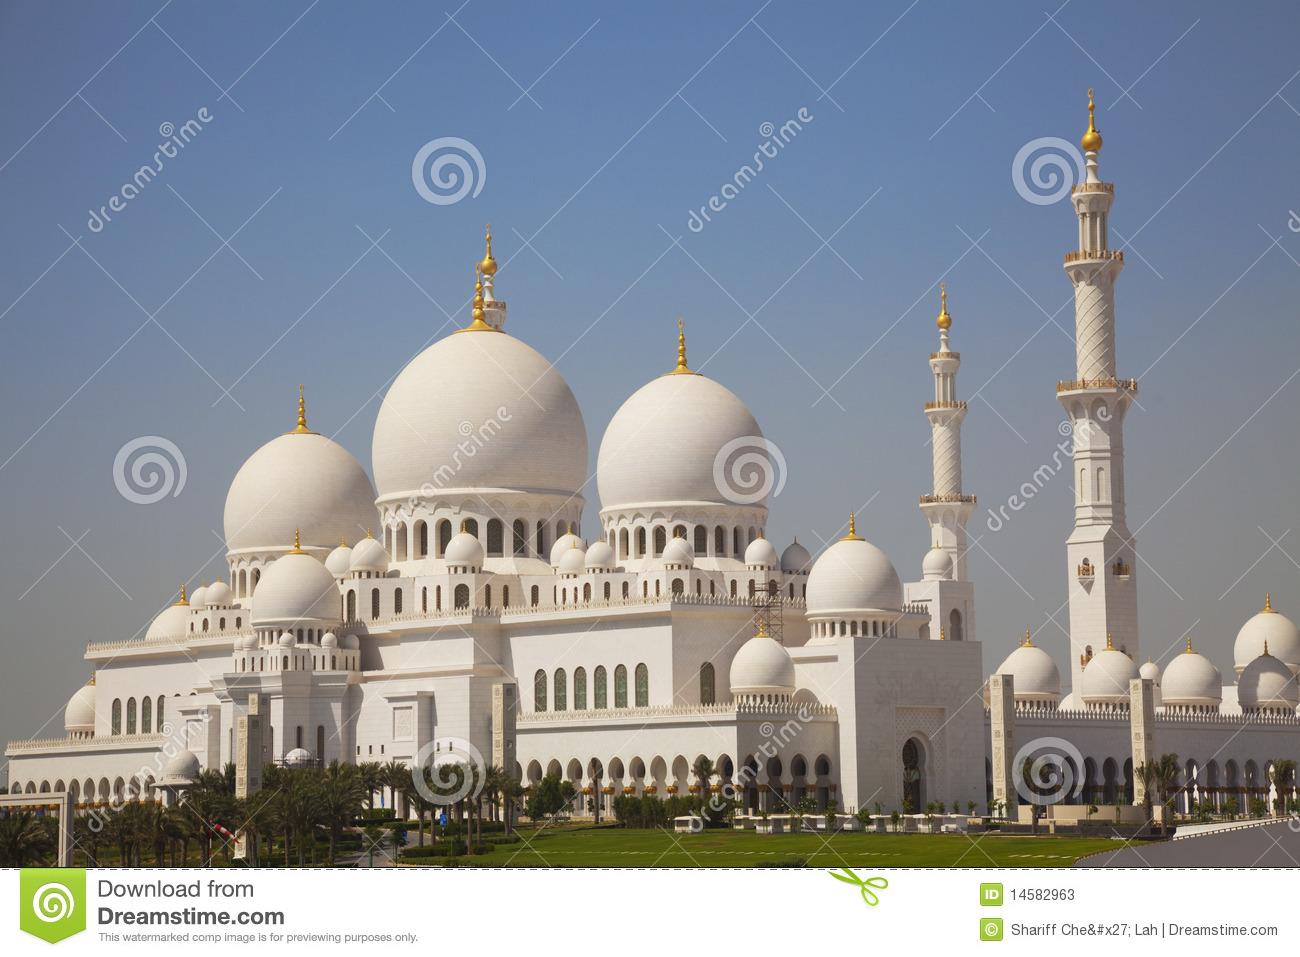 Sheikh Zayed Grand Mosque, Abu Dhabi, UAE Stock Photos.